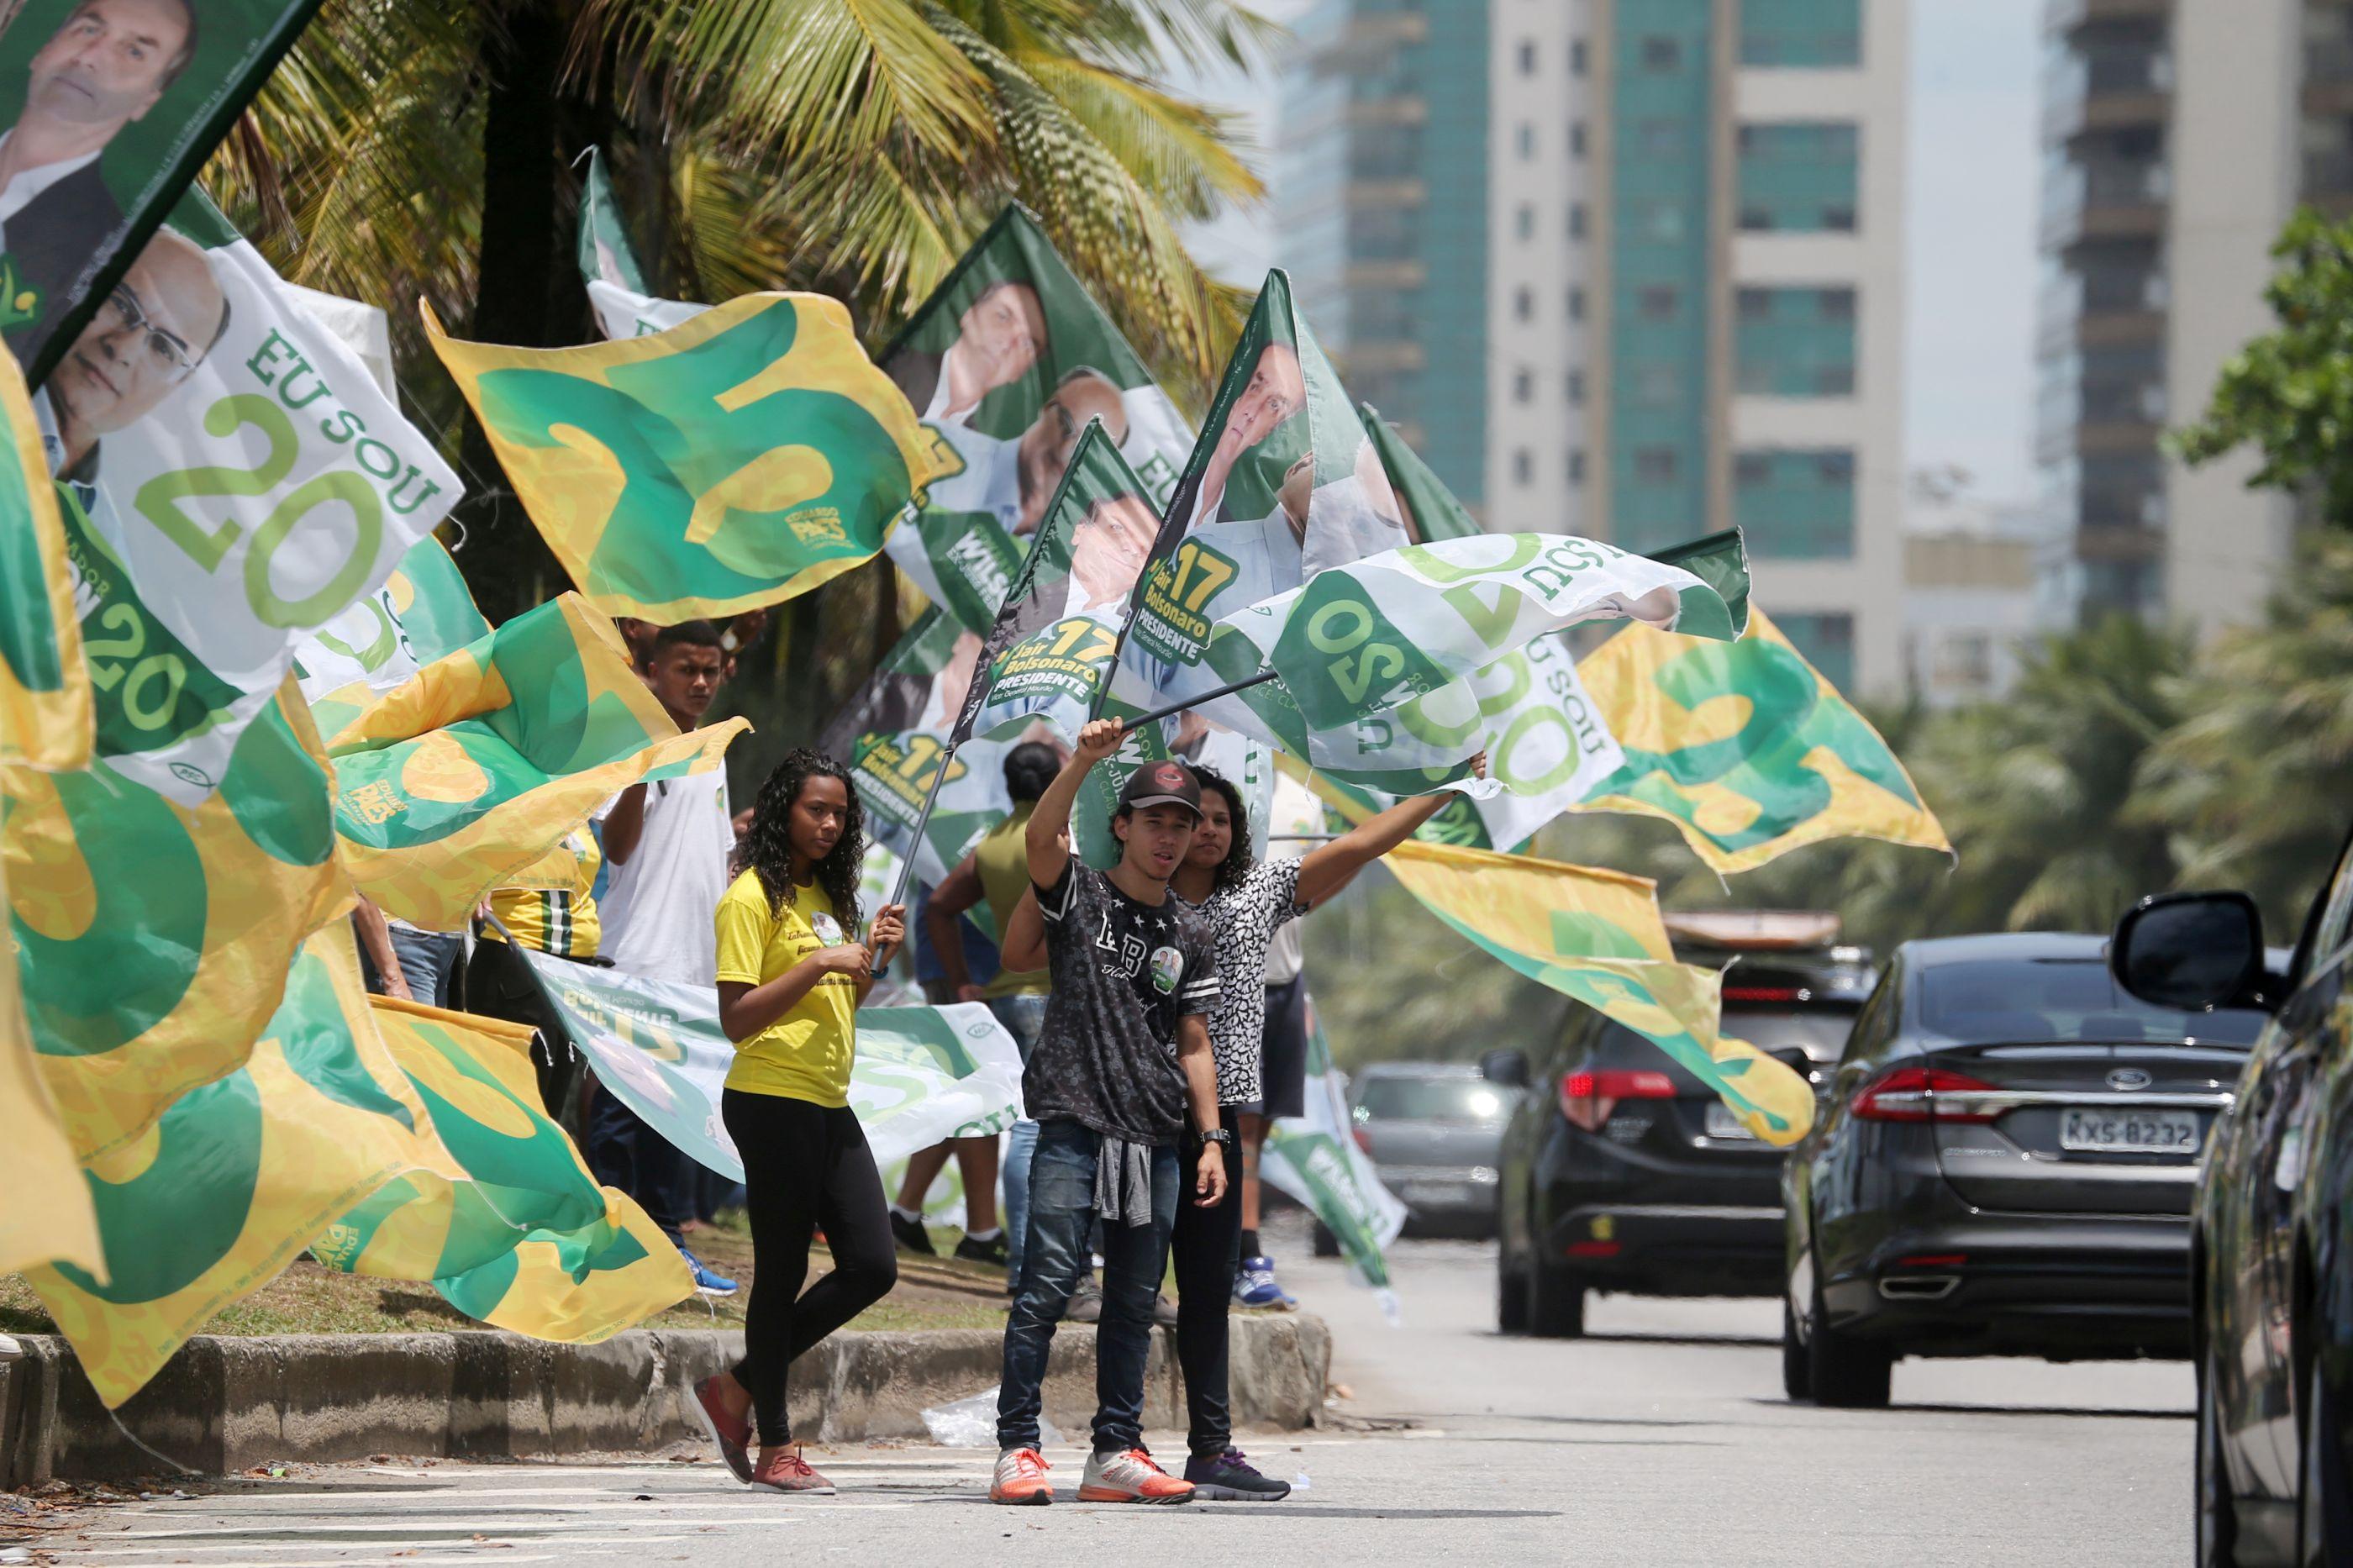 Bolsonaro ou Haddad? É hoje o dia de eleger próximo presidente do Brasil